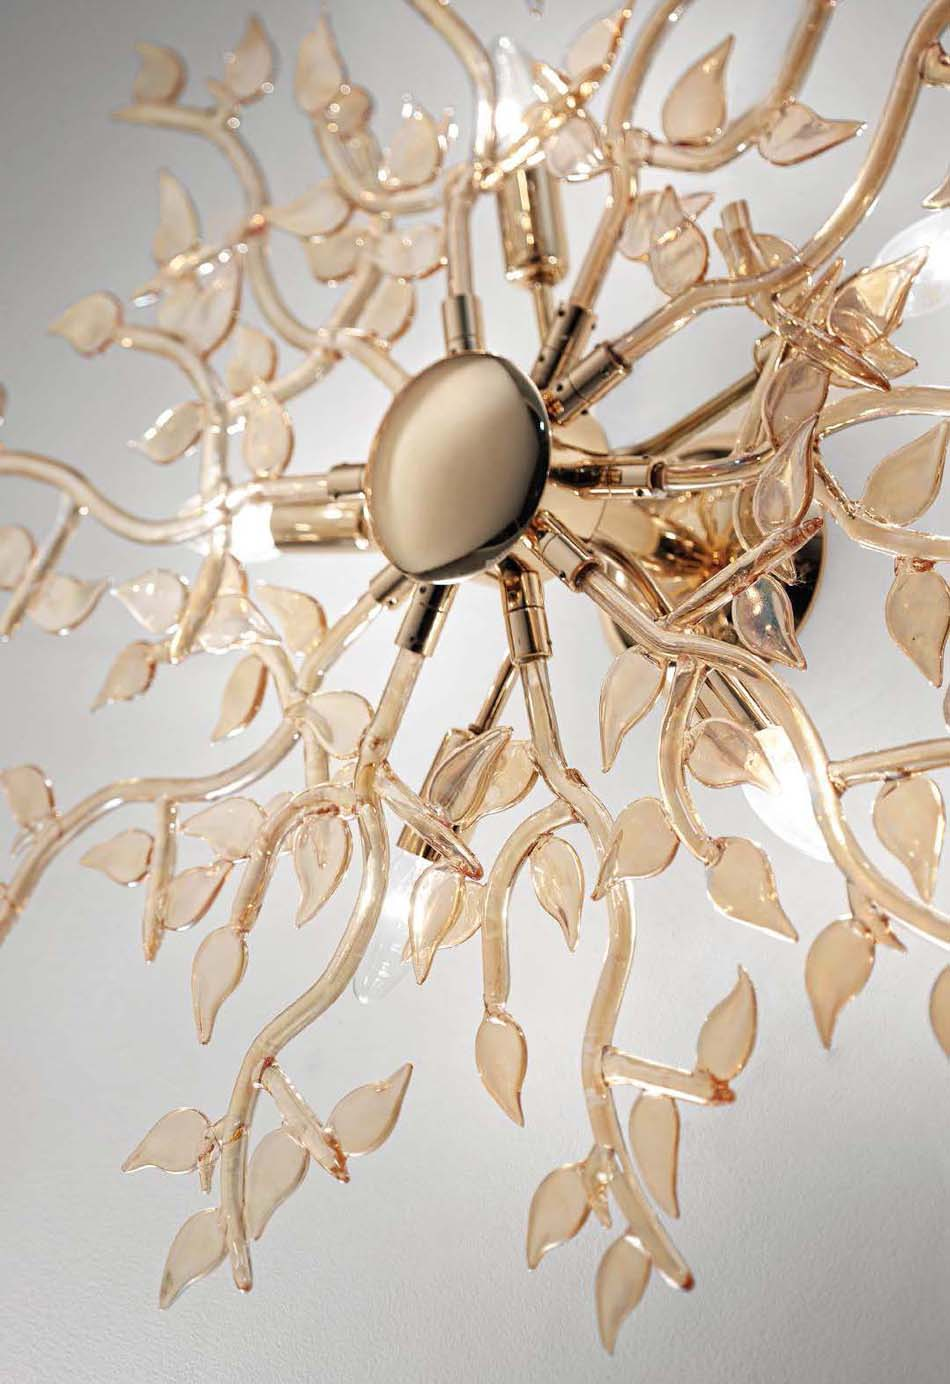 Lampade 43 soffitto parete Ideal Lux Spring – Toscana Arredamenti